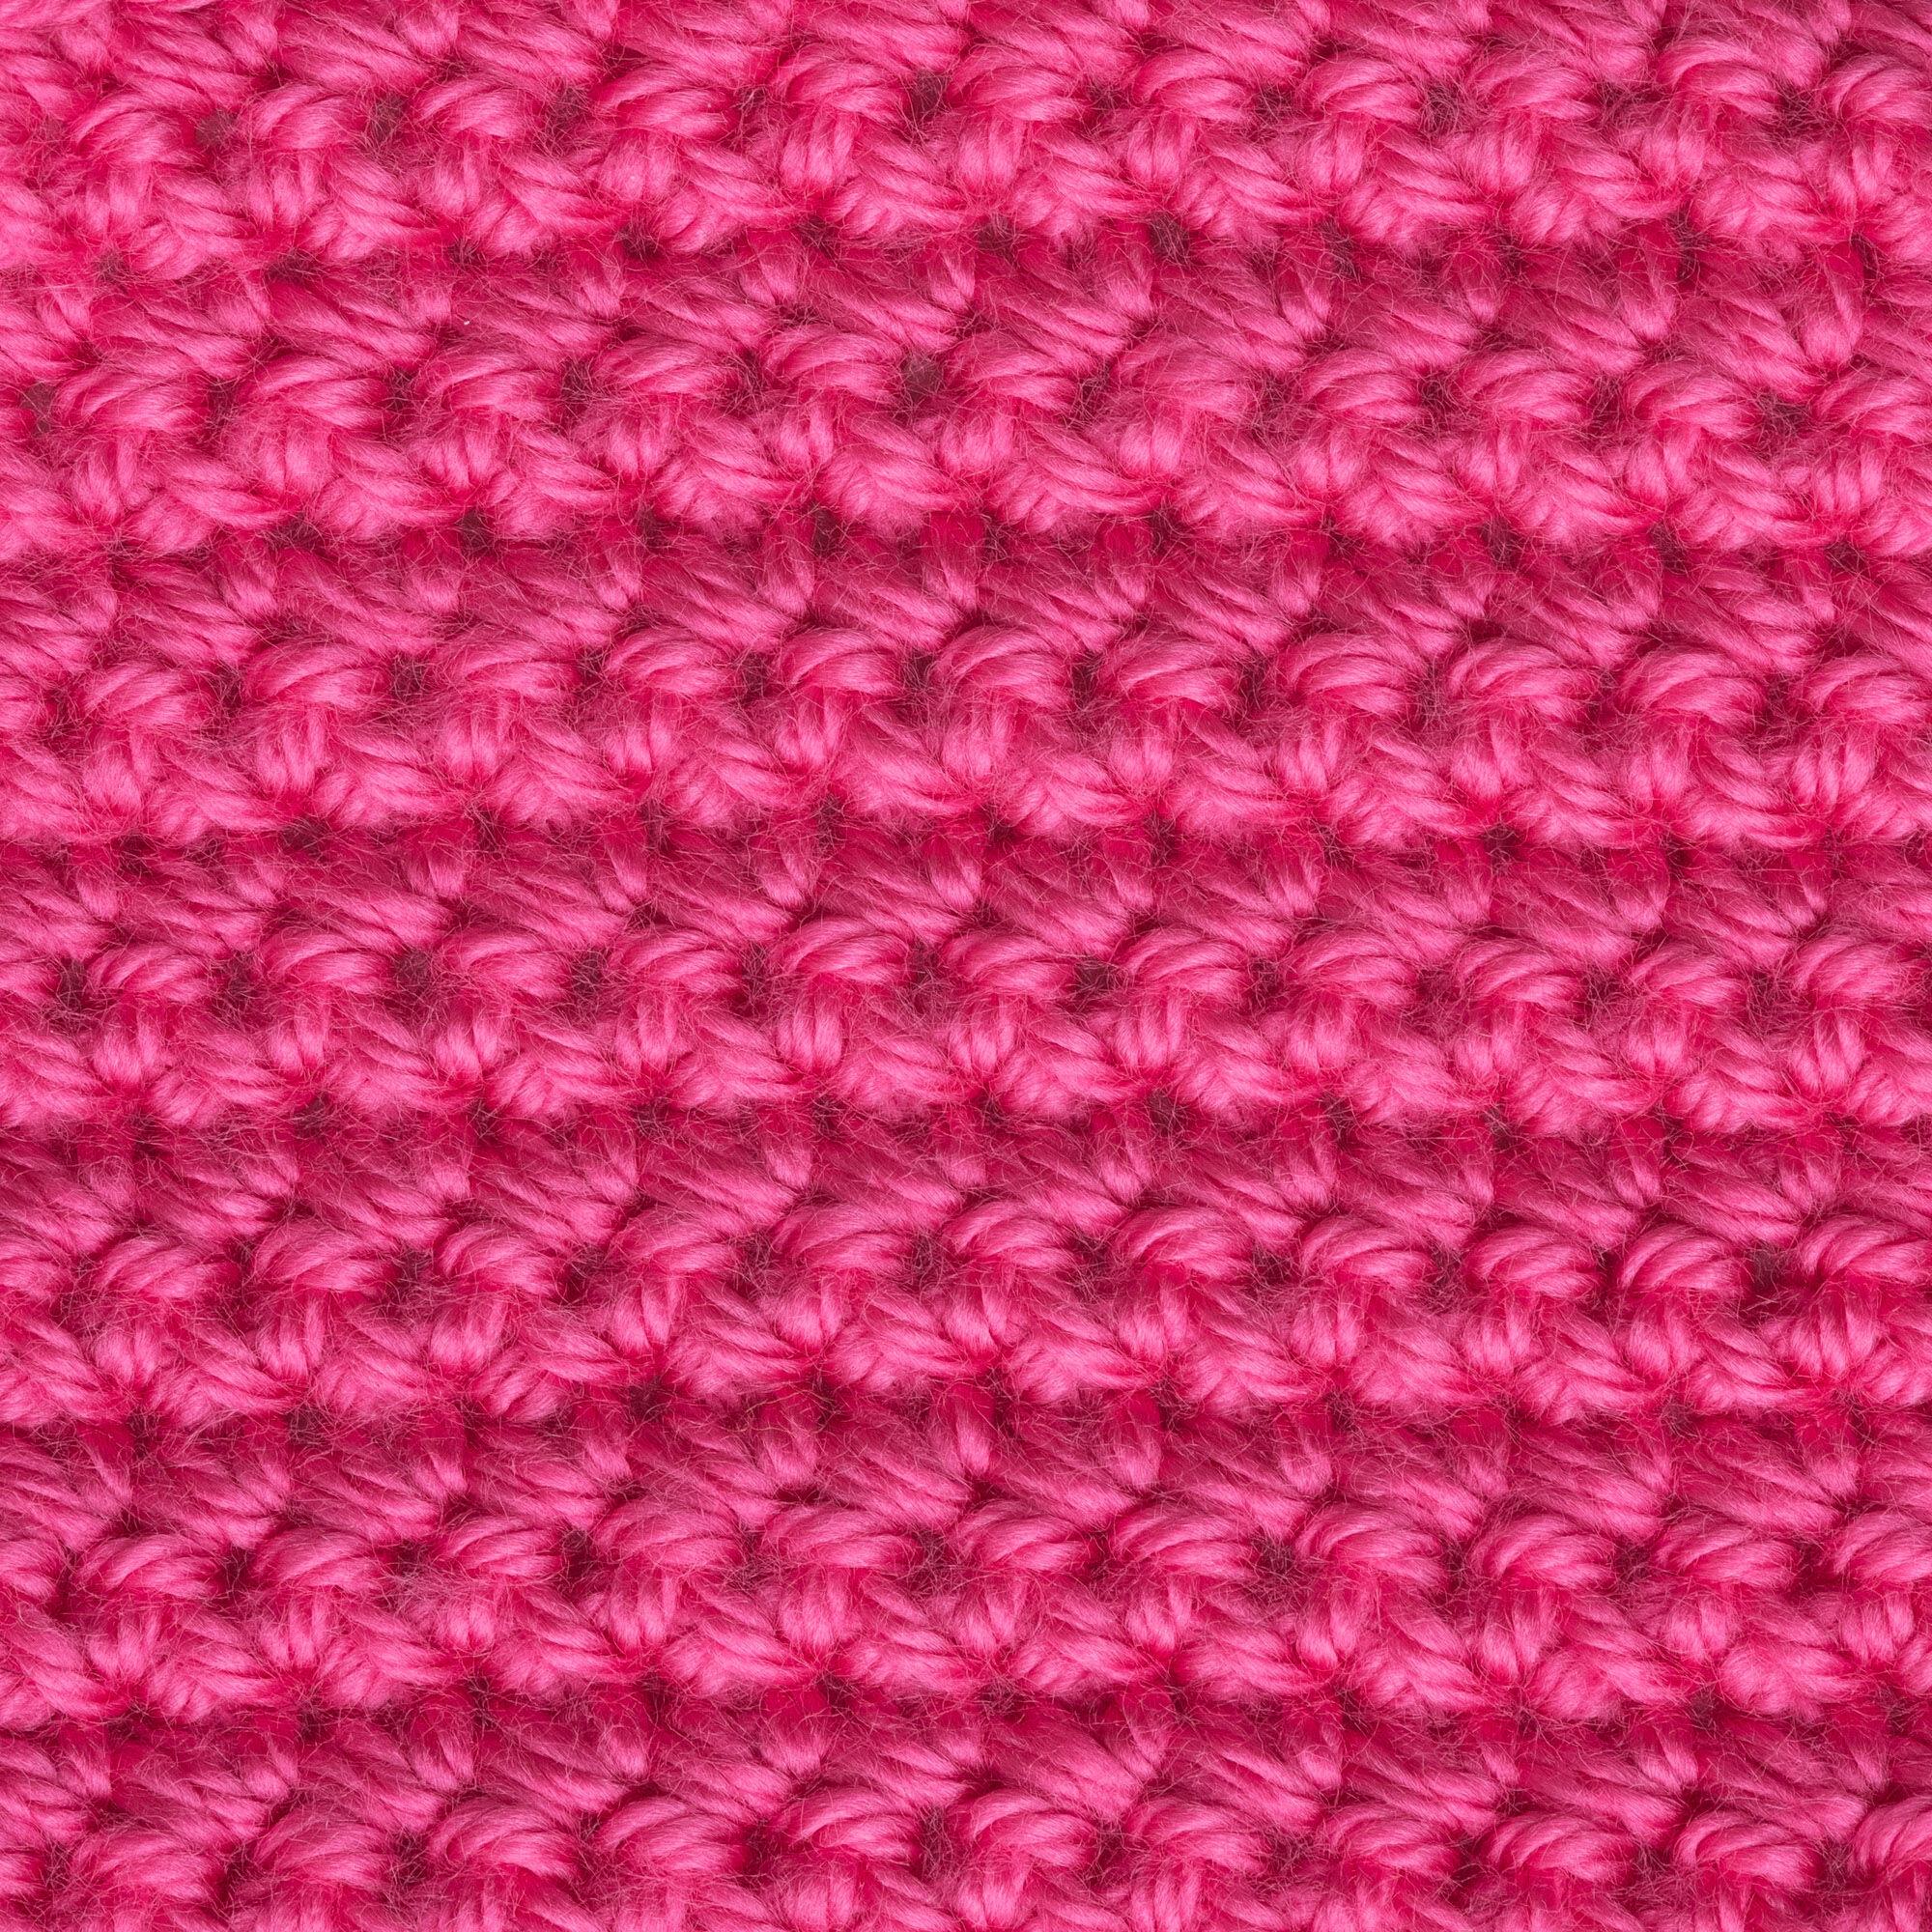 6 oz Crochet Knitting Ball Watermelon #9604 New Caron Simply Soft Yarn Skein